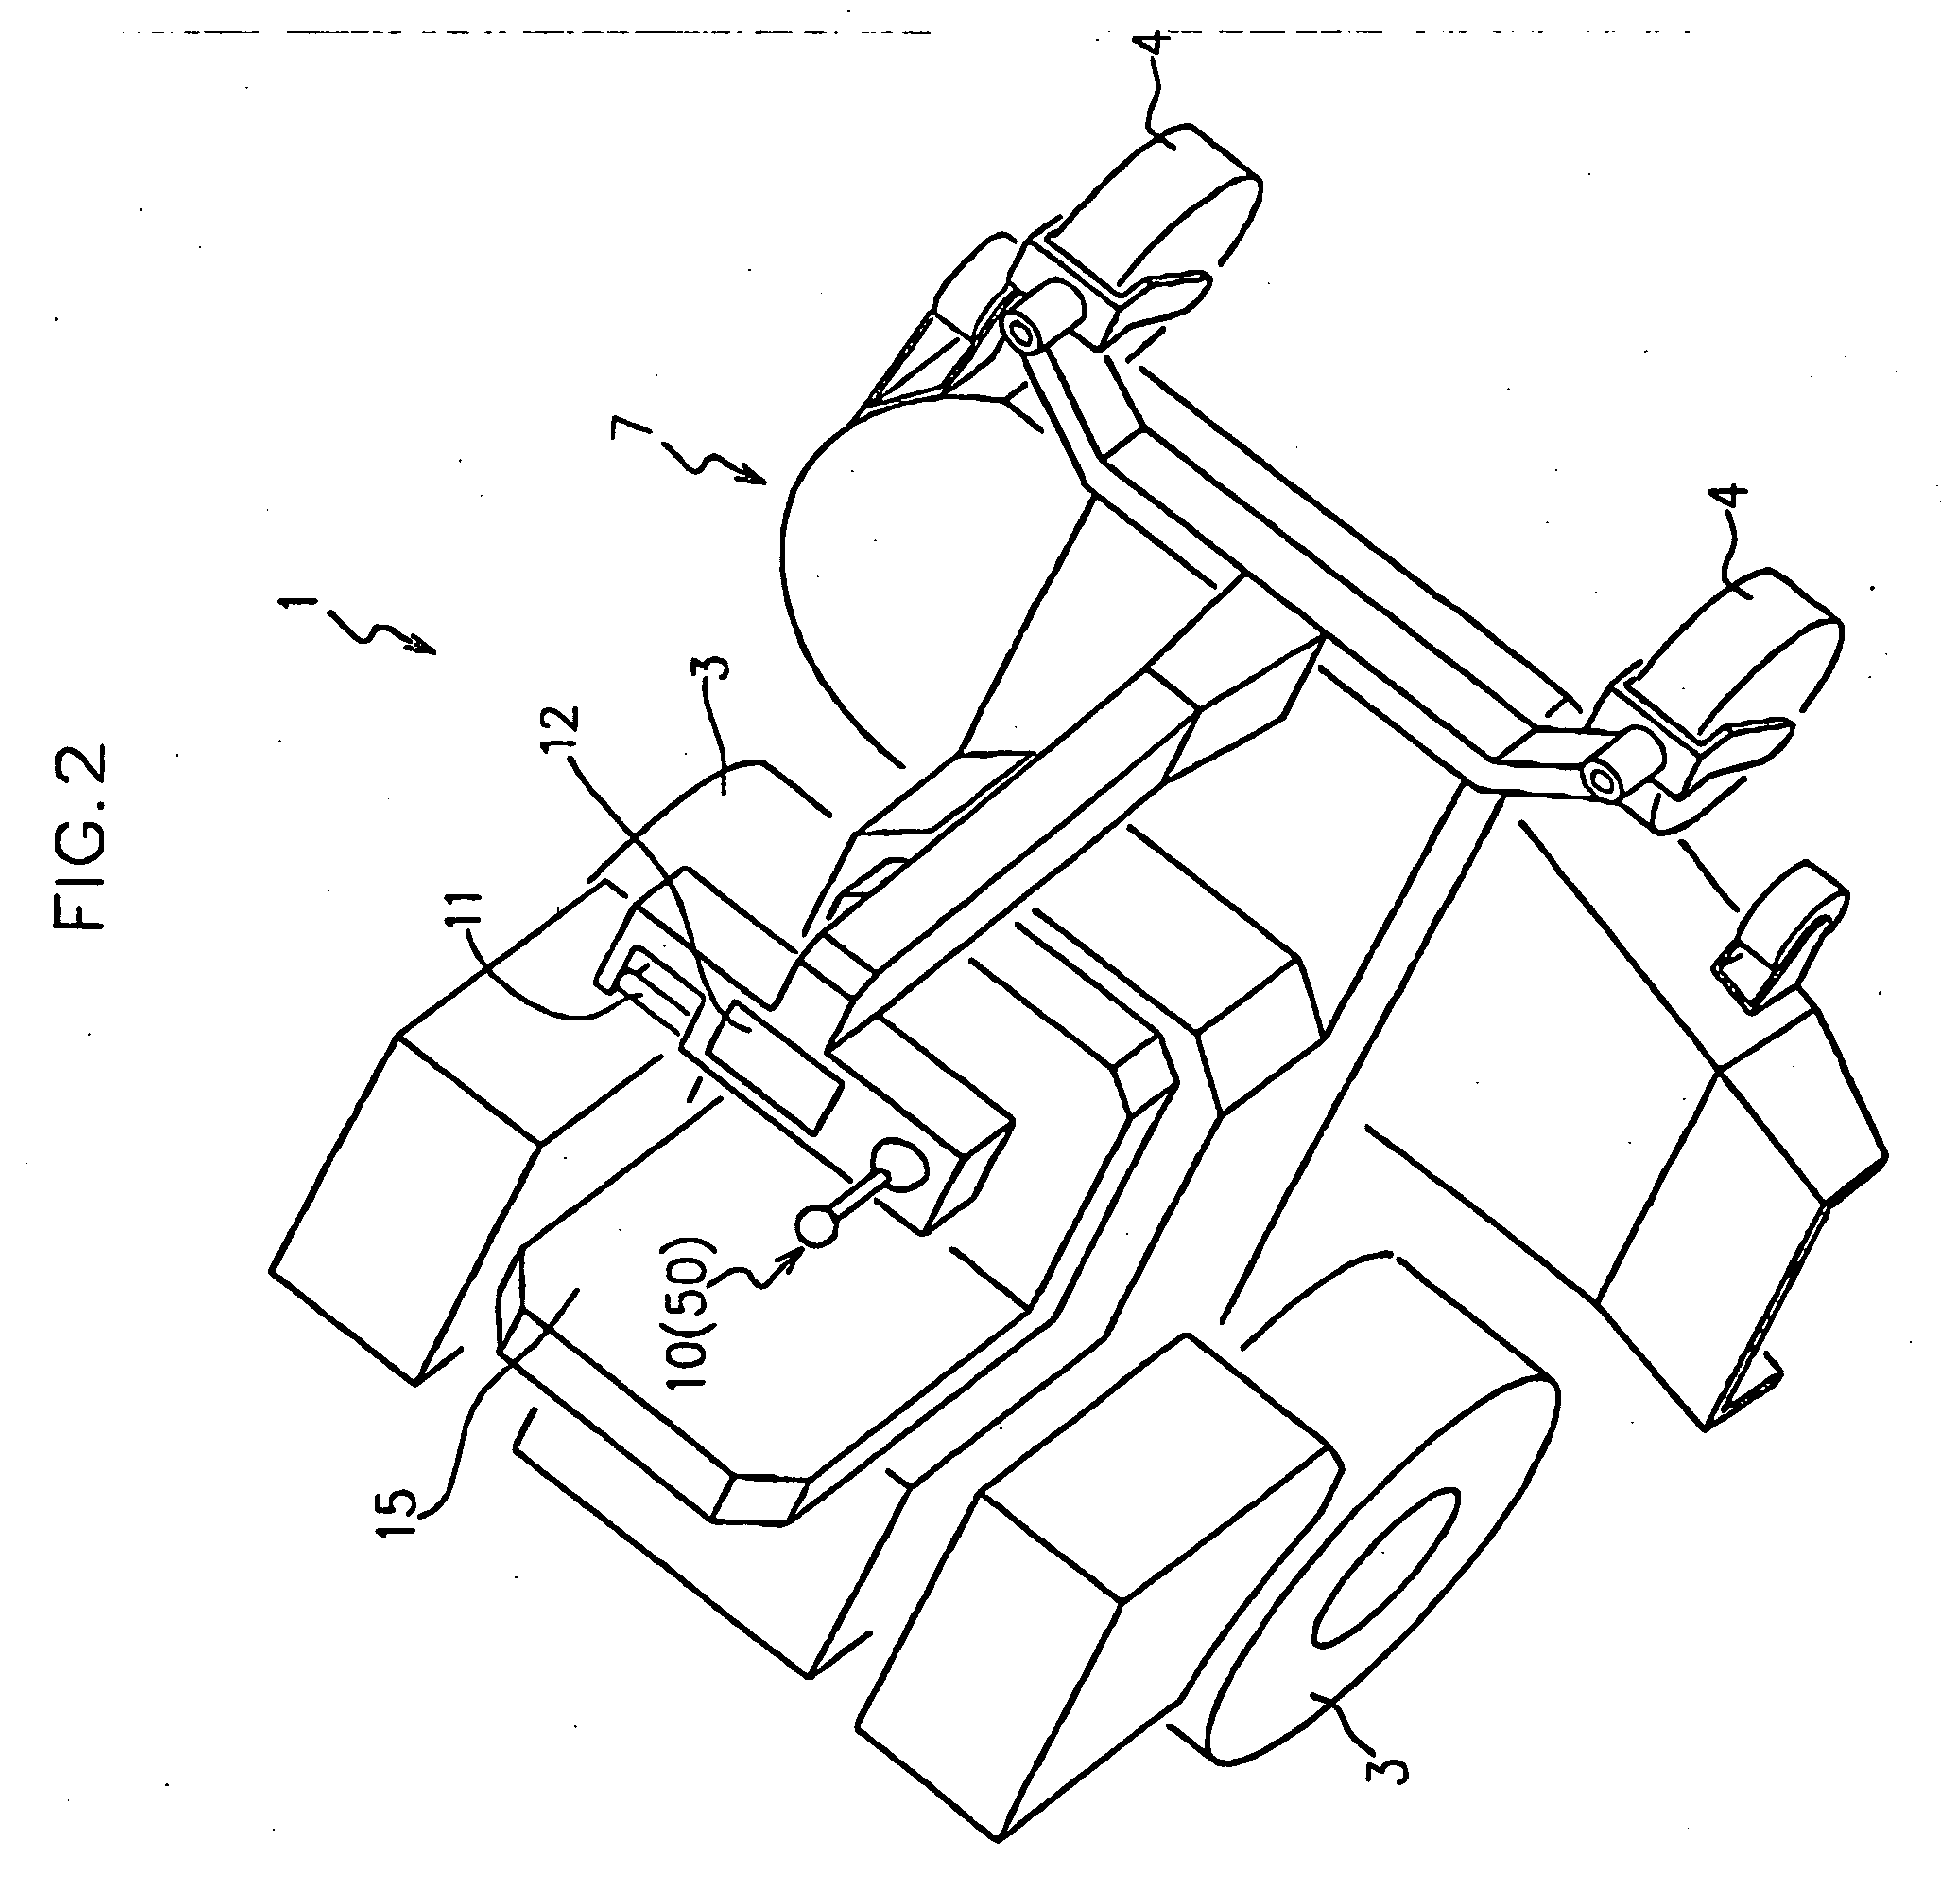 patente ep1724498b1 transmission hydrostatique pour tondeuse google patentes. Black Bedroom Furniture Sets. Home Design Ideas